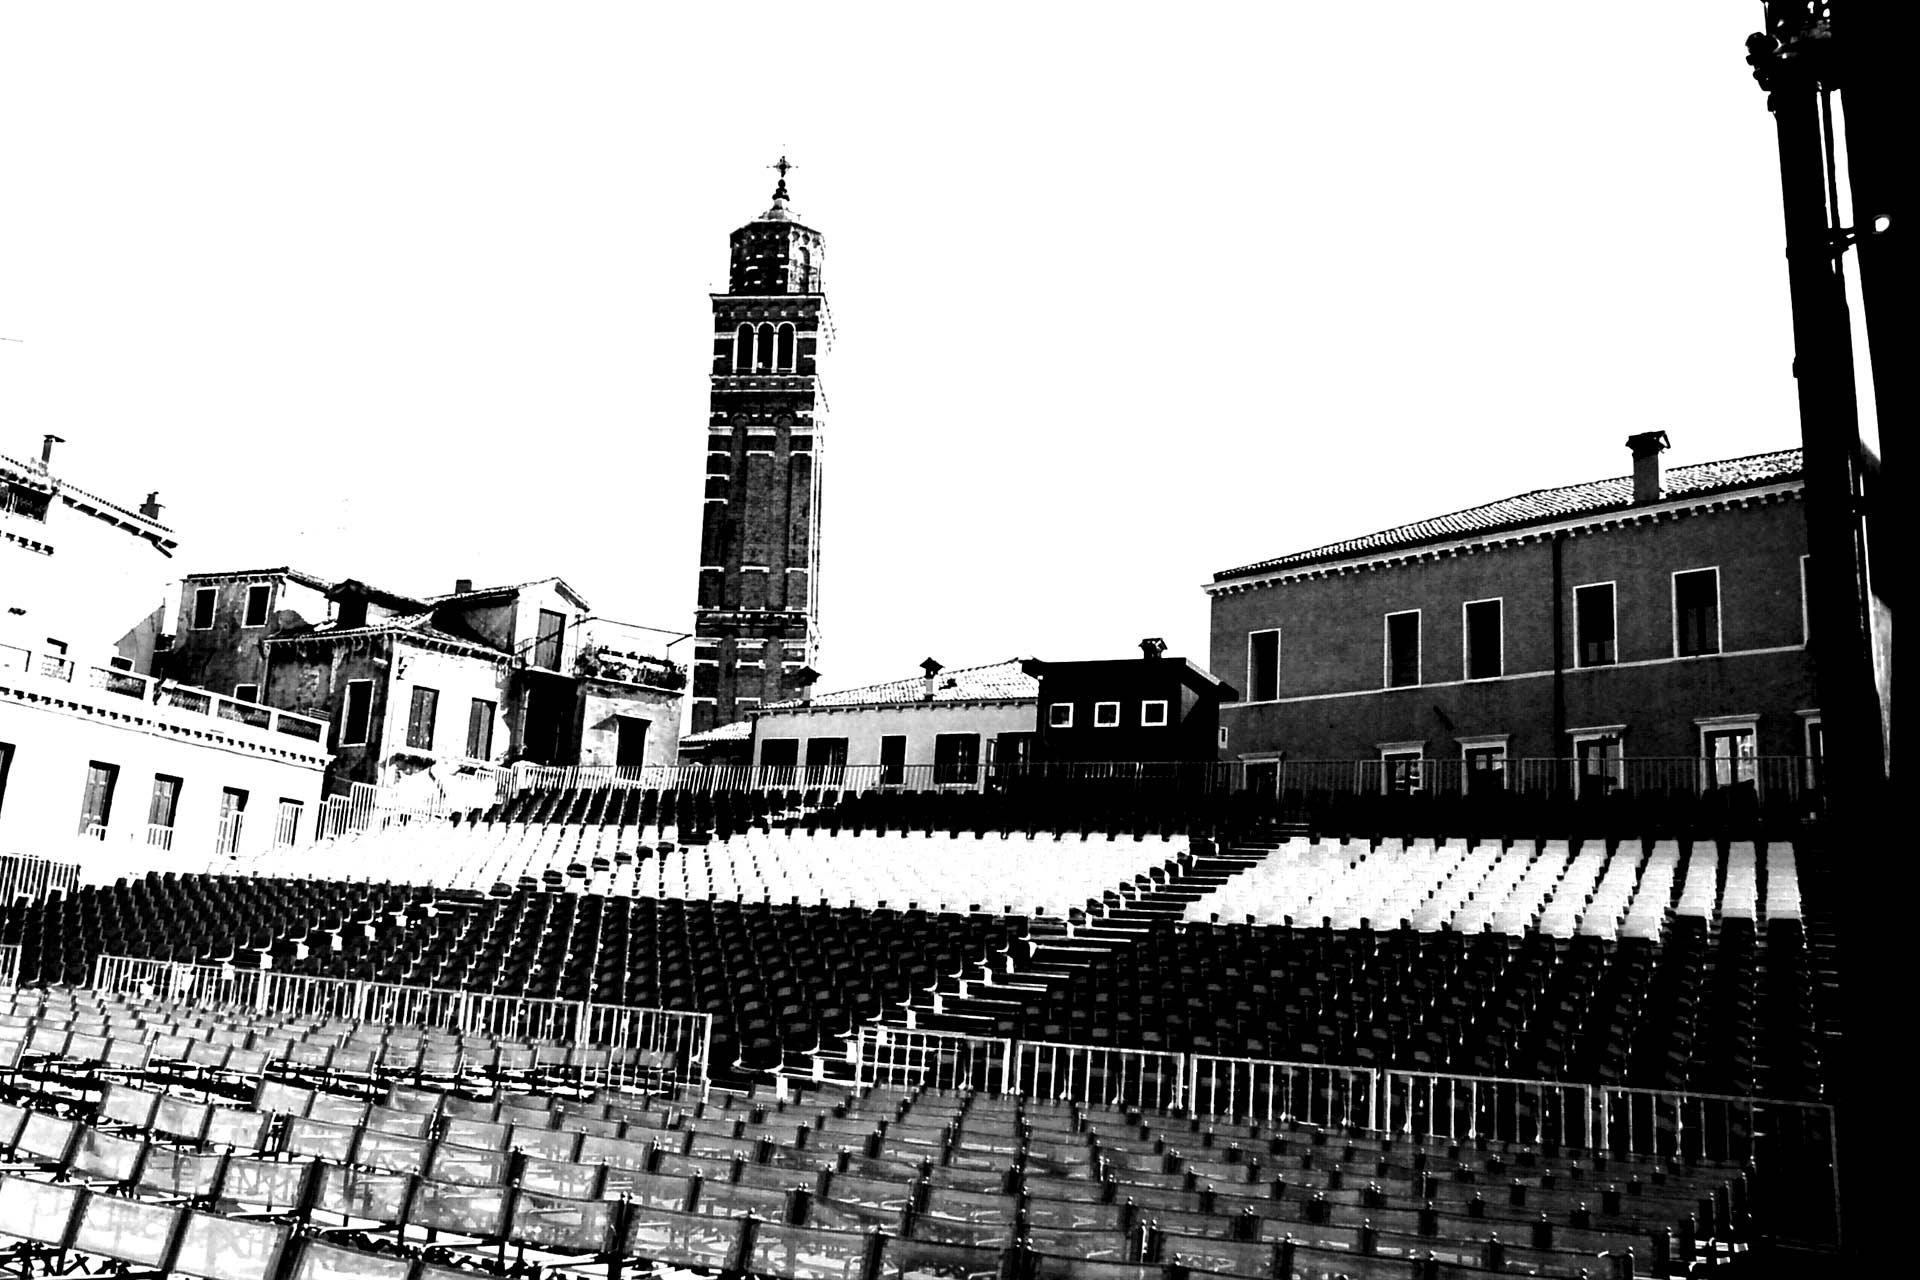 Festival del cinema-Venezia 1995